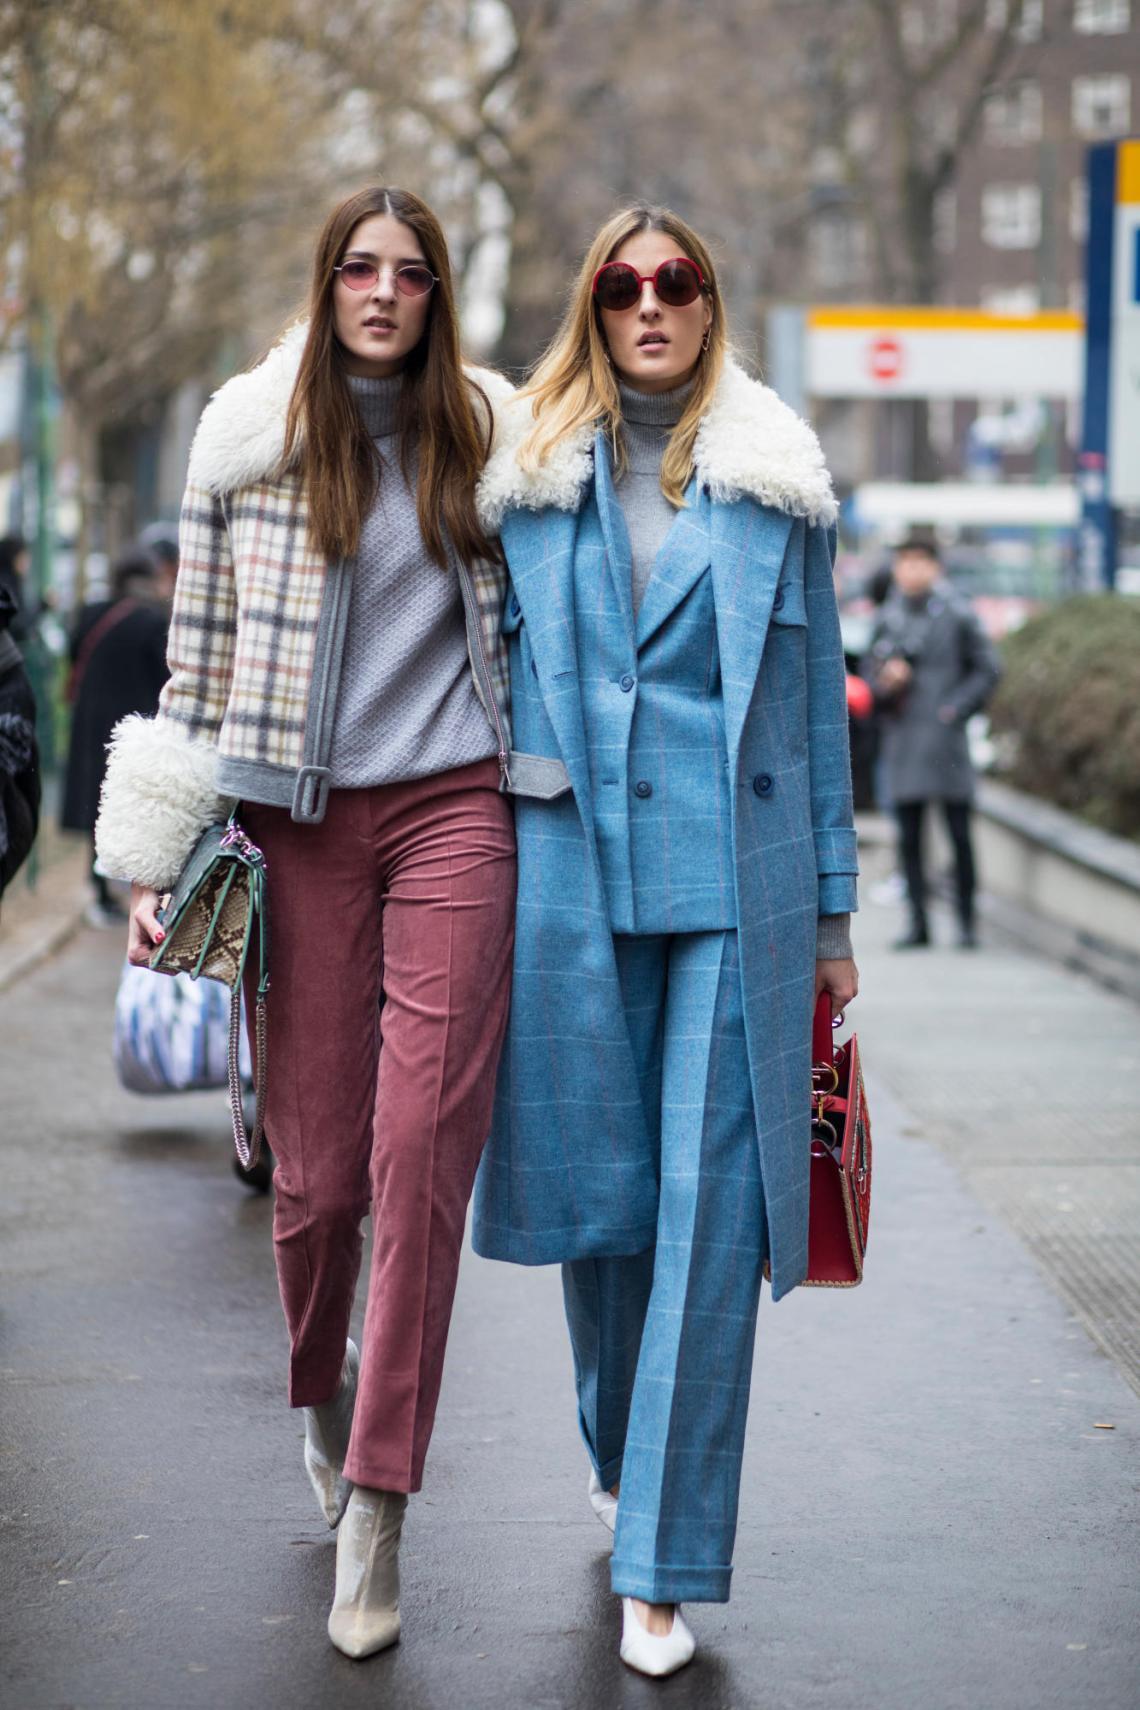 milan-fashion-week-street-style-fall-2018-day-2-8